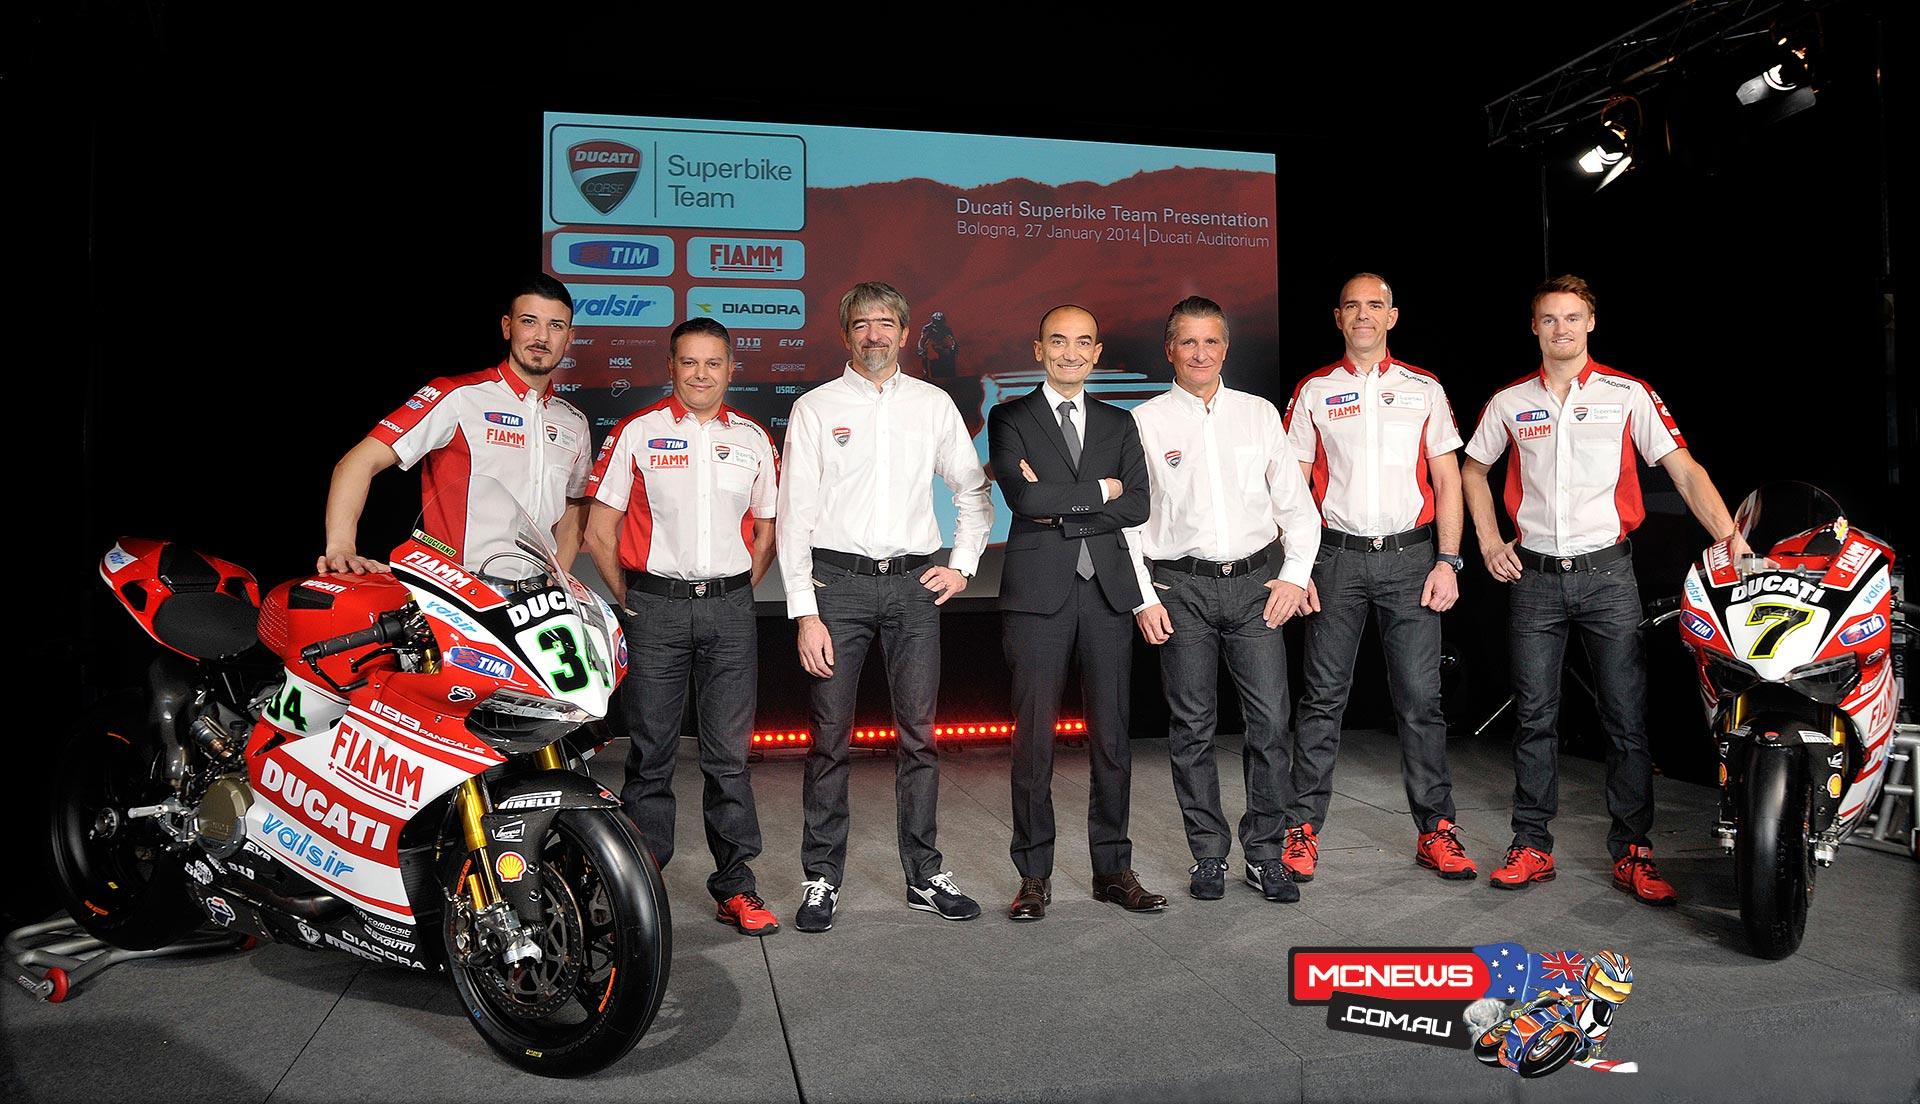 Team Ducati WSBK Presentation 2014